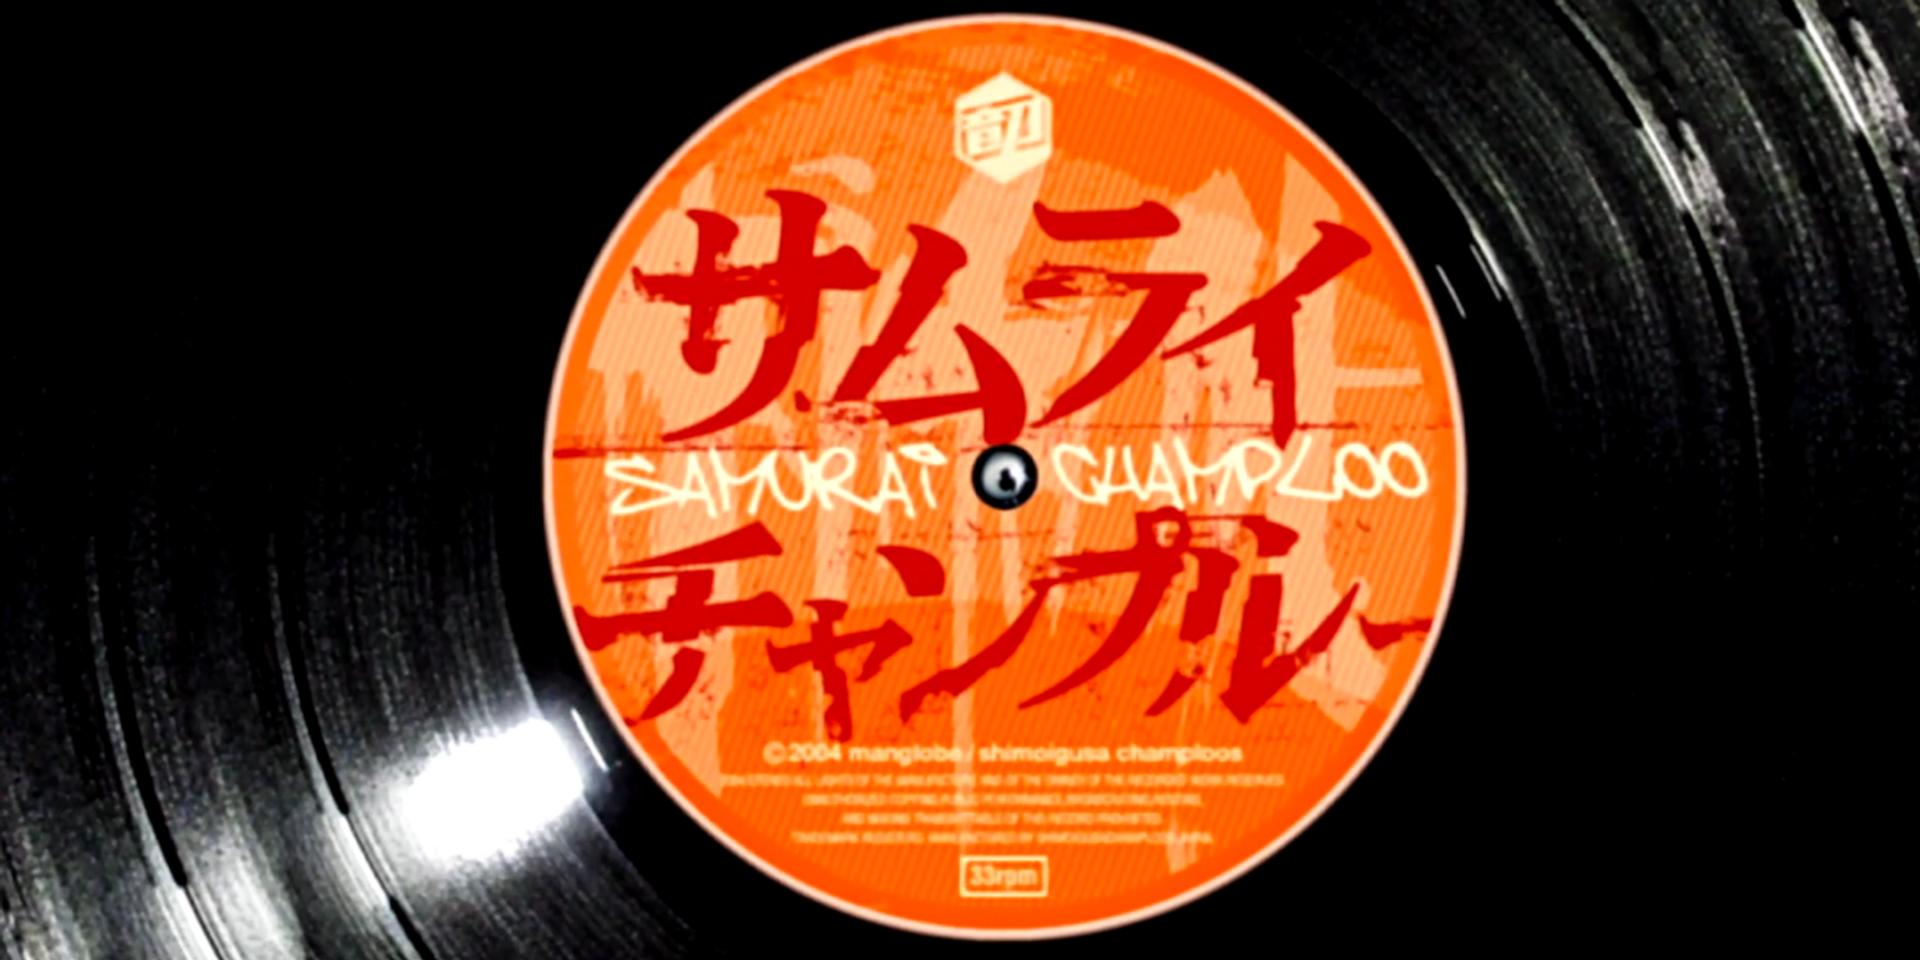 Essentials: Nujabes & Fat Jon's Samurai Champloo Music Record - Departure (2004)